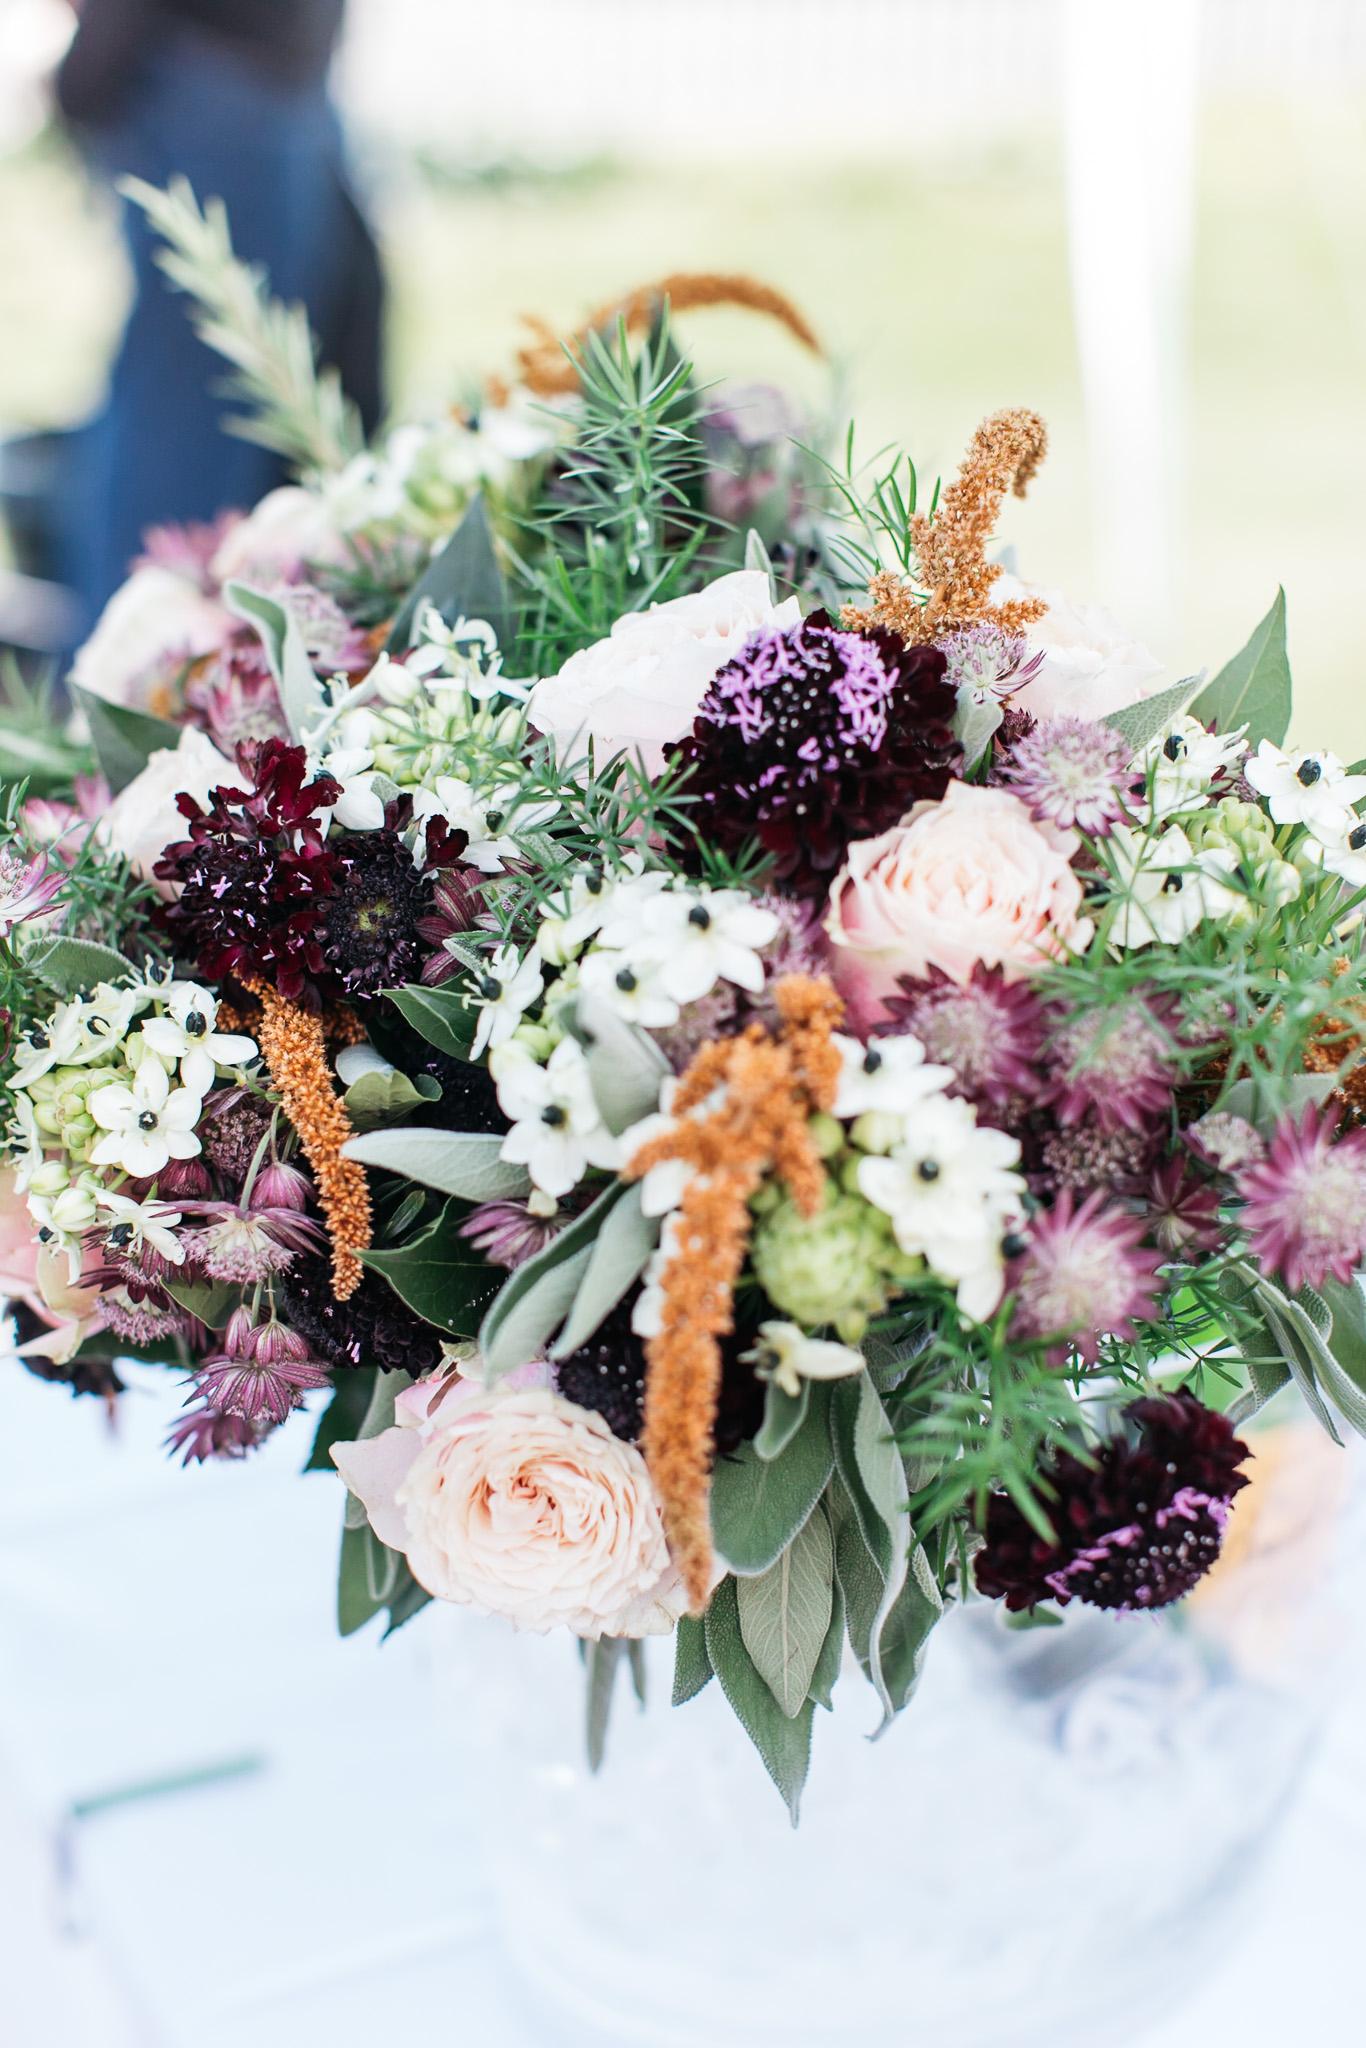 st_andrews_fabrica_brighton_wedding_577.jpg